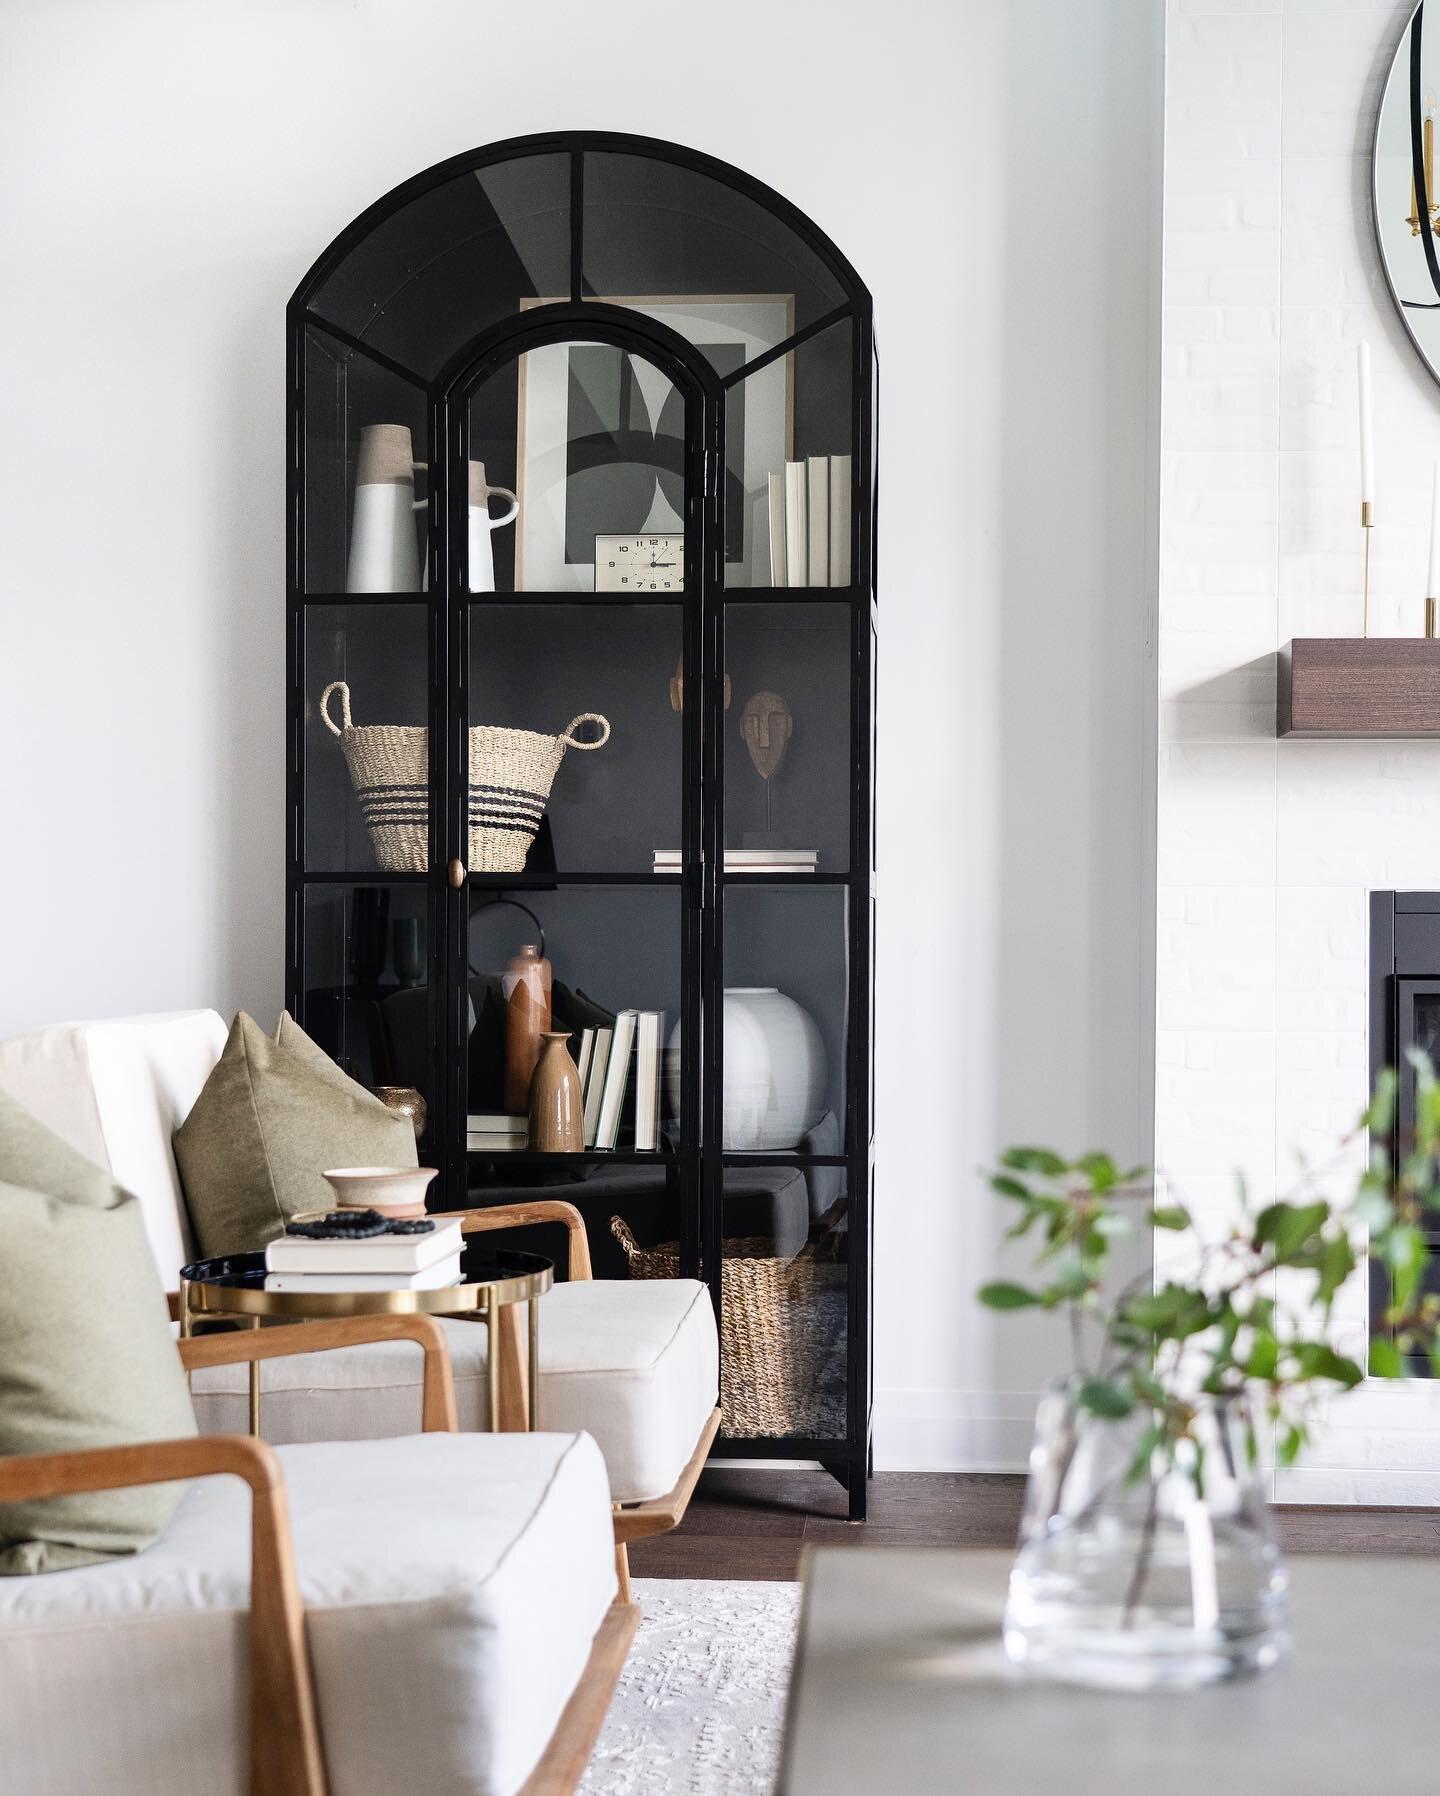 Shop the living room |   Lily Cabinet  ,   Bago Armchair  ,   Sai Basket